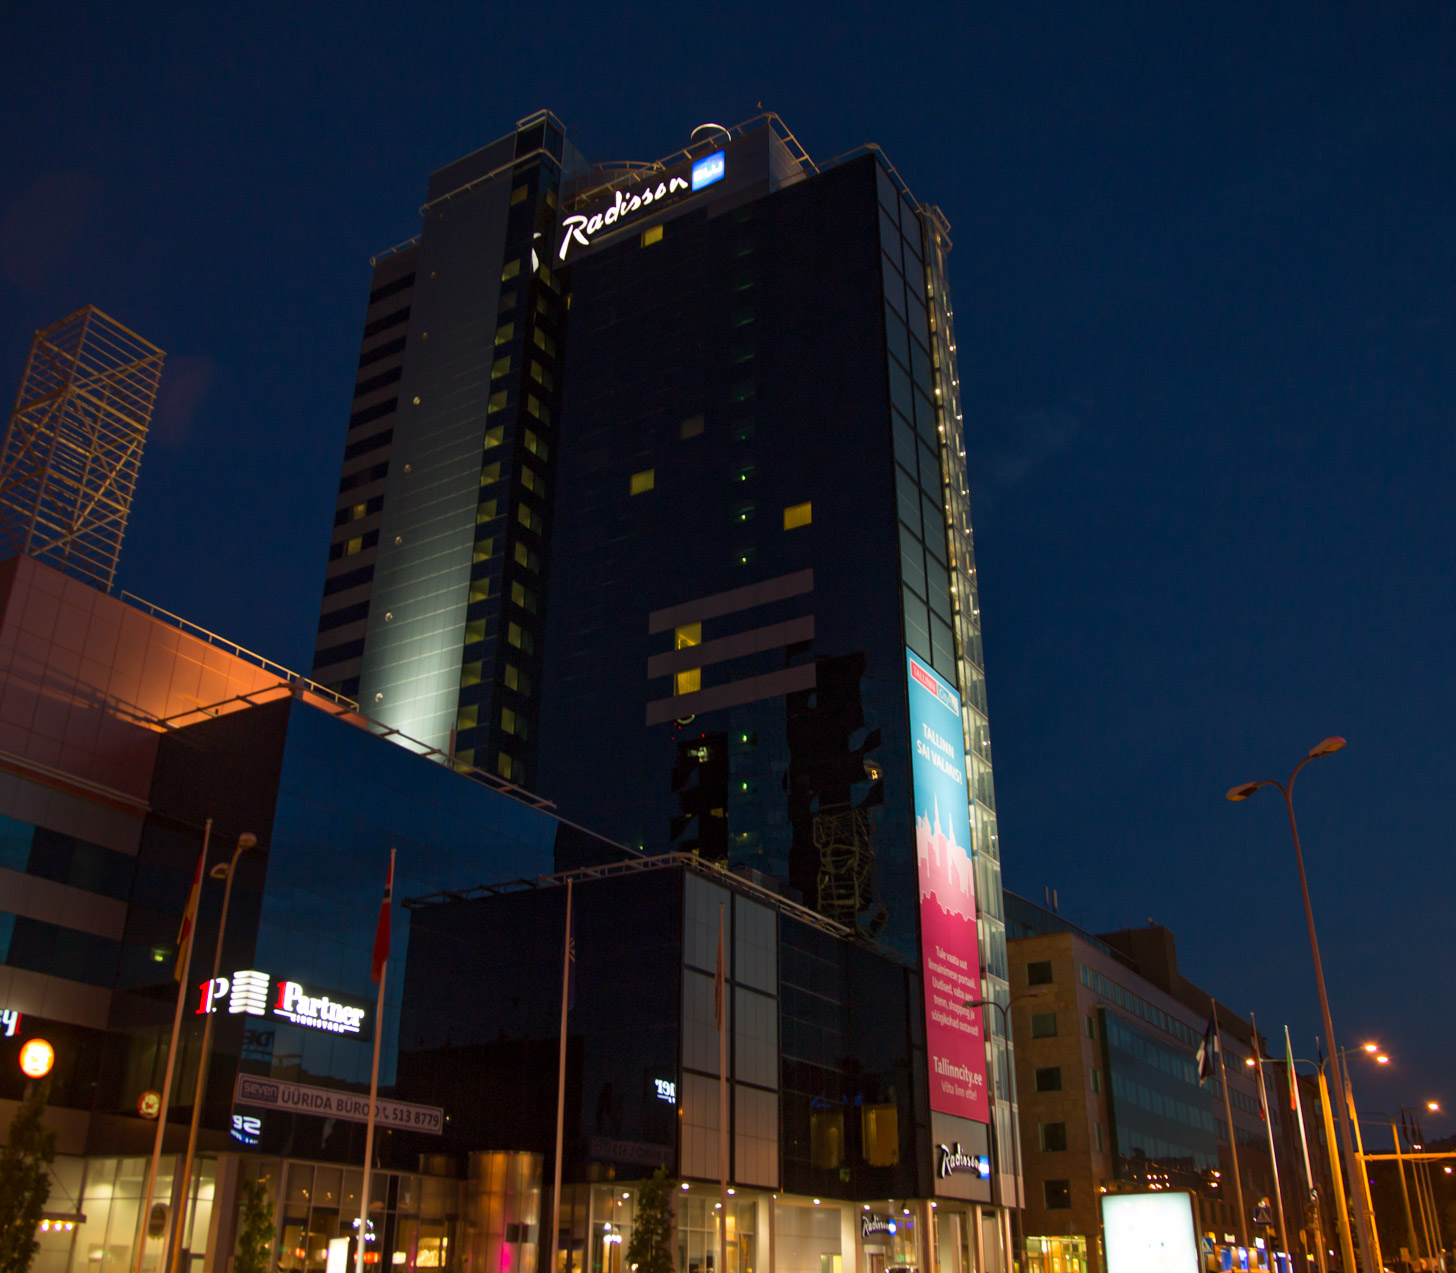 Het Radisson hotel in Tallinn